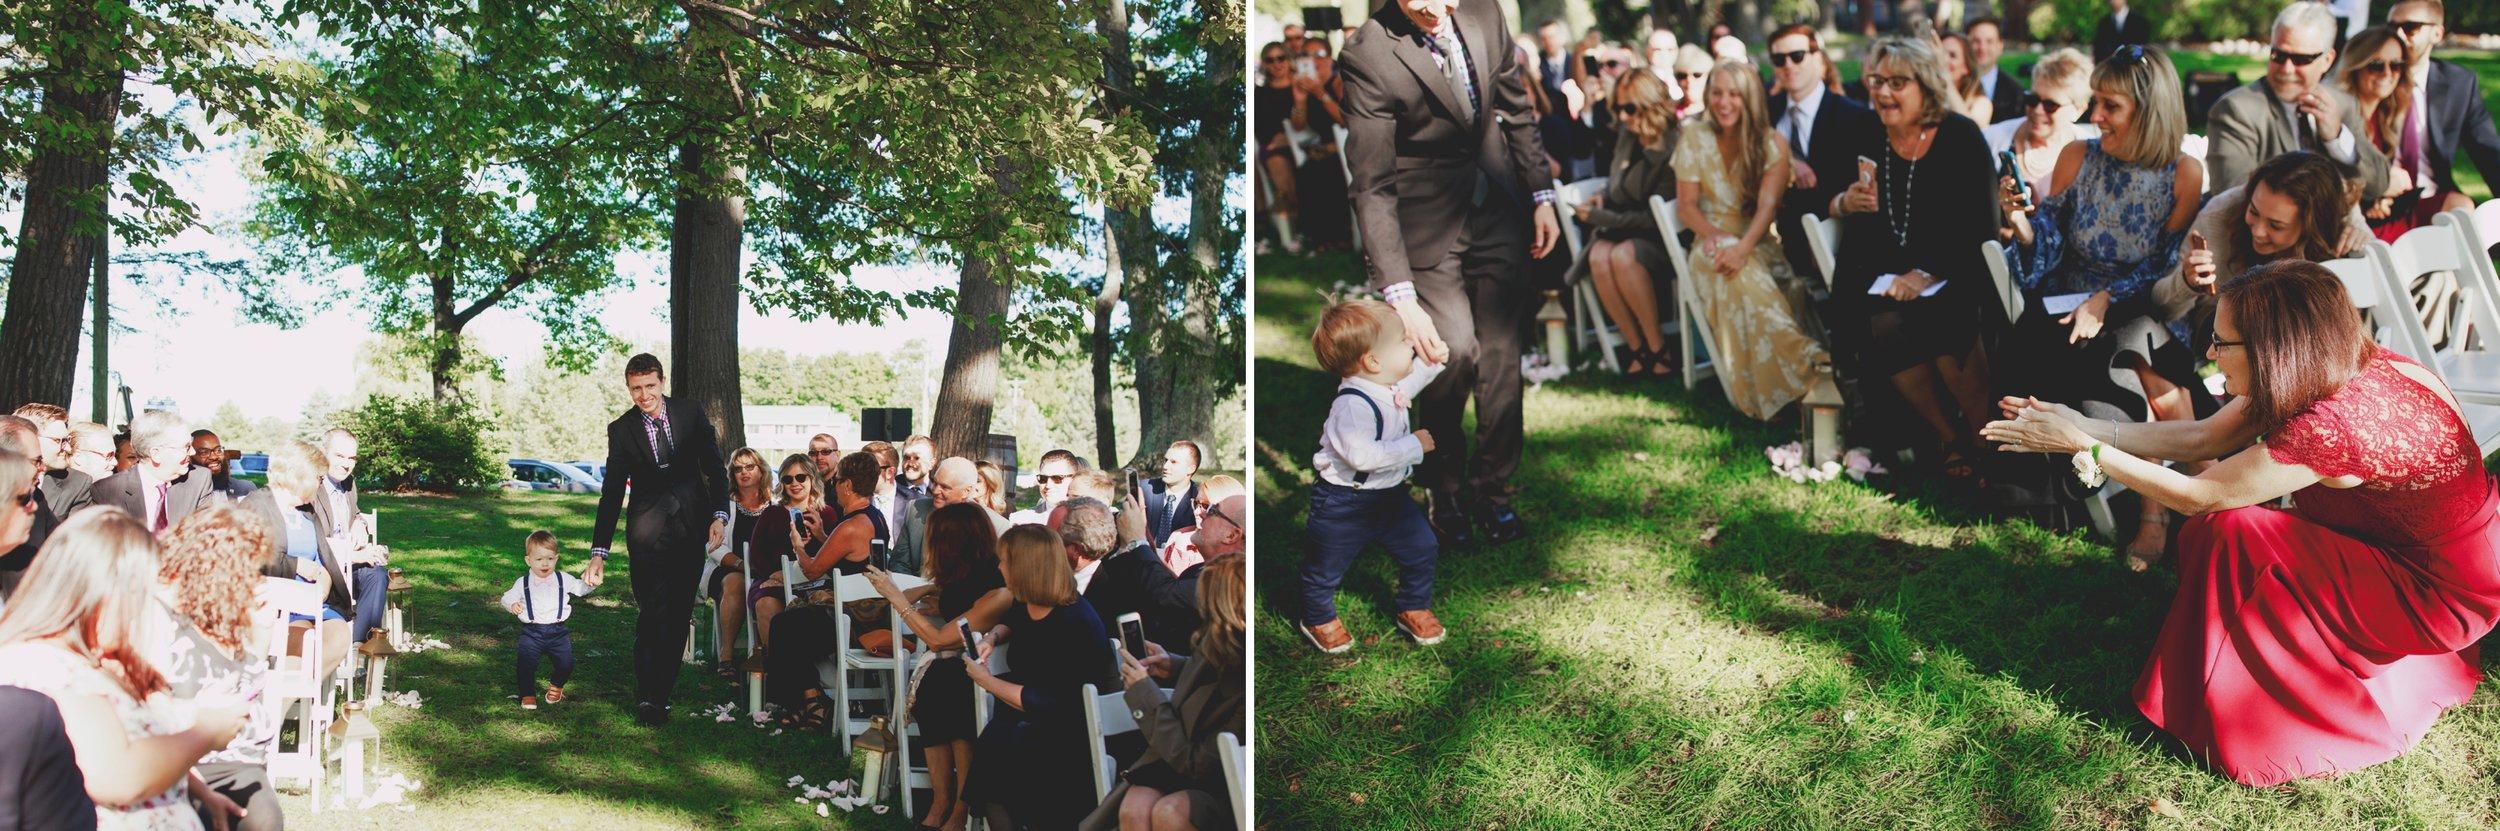 traverse_city_wedding_048.jpg